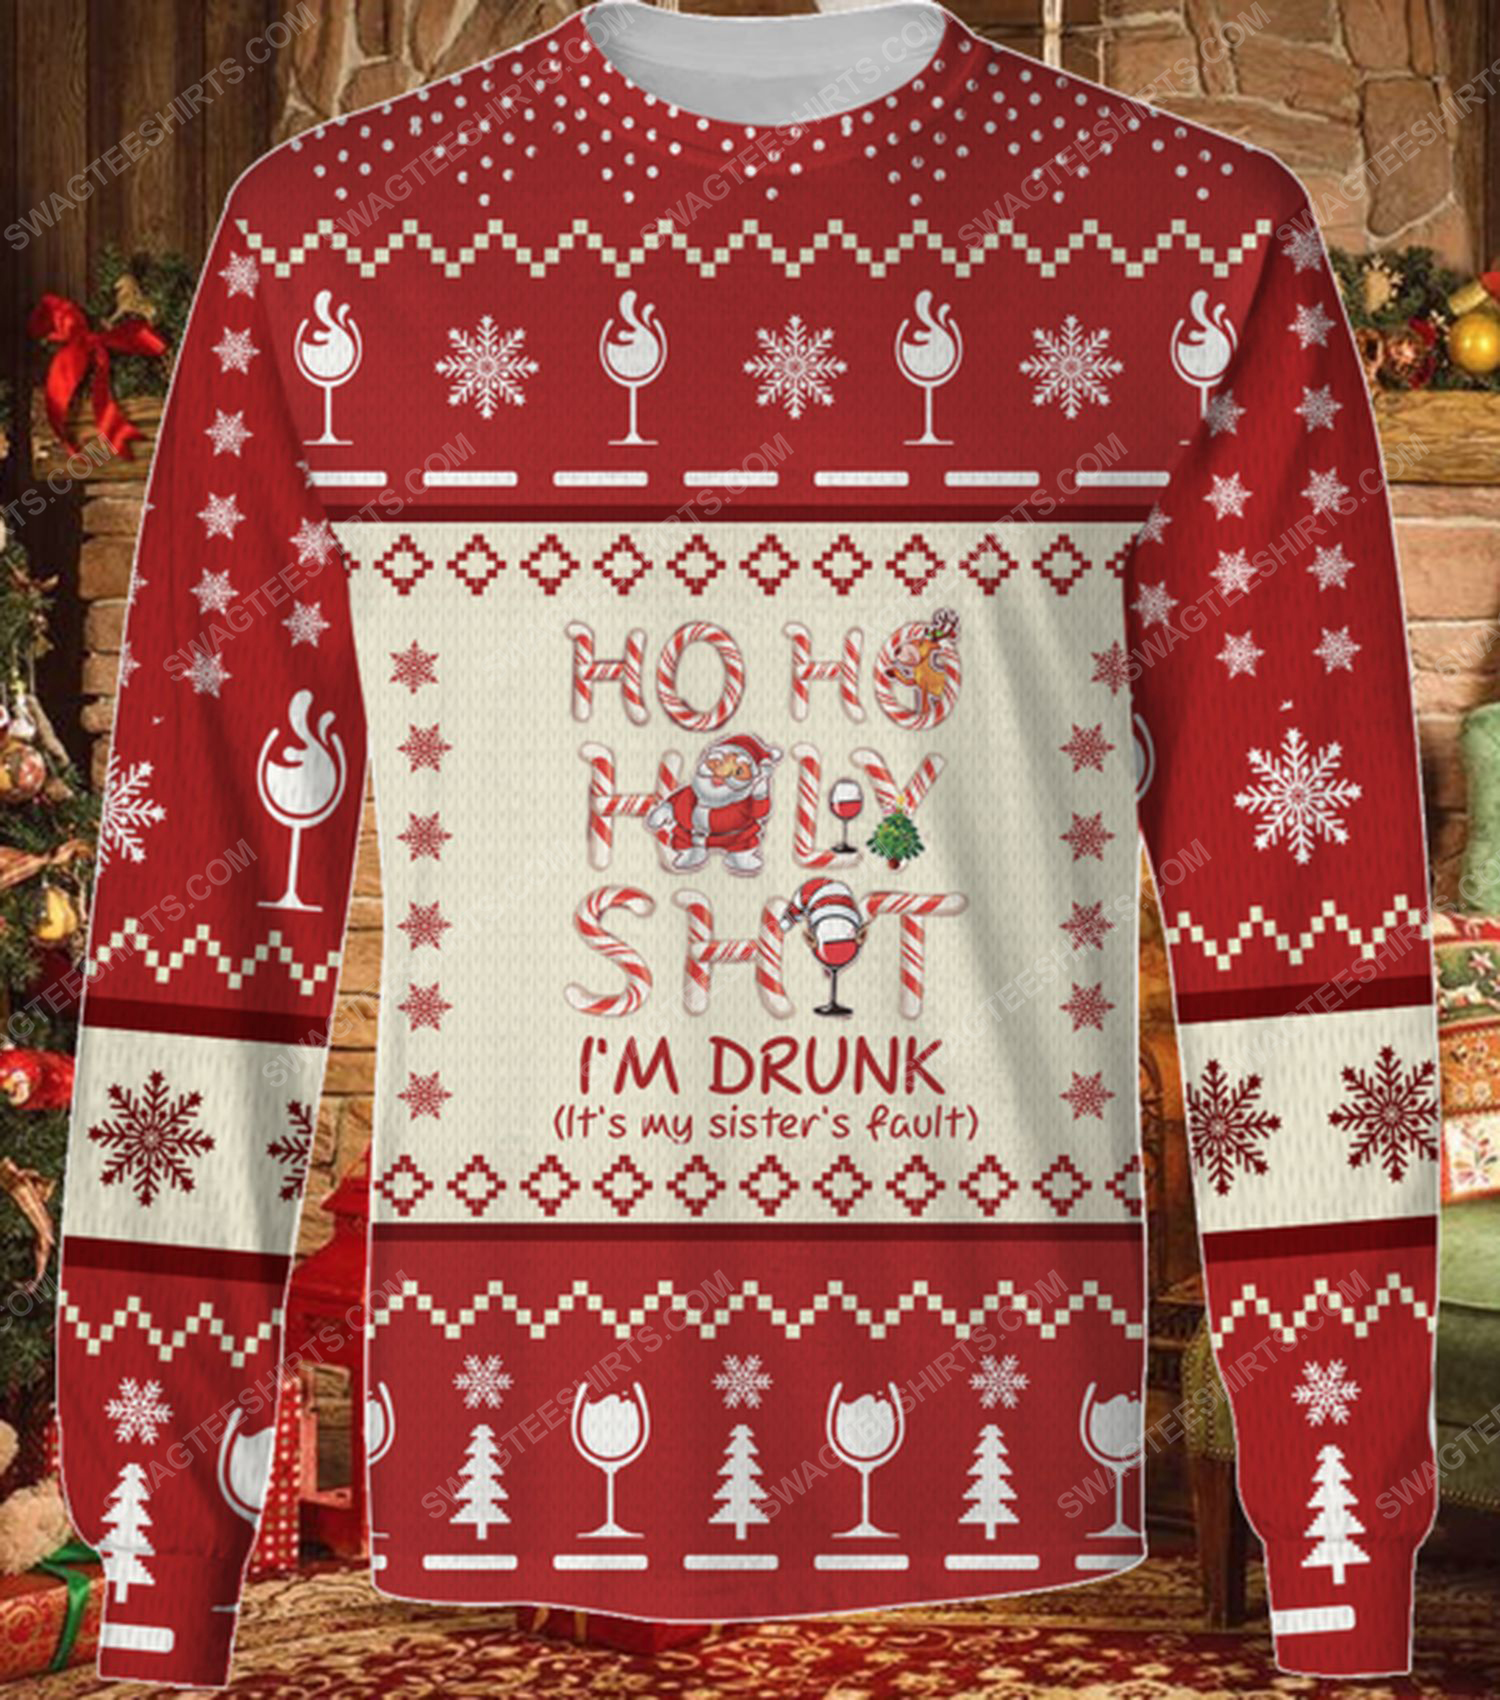 Ho ho holy shit i'm drunk wine santa ugly christmas sweater